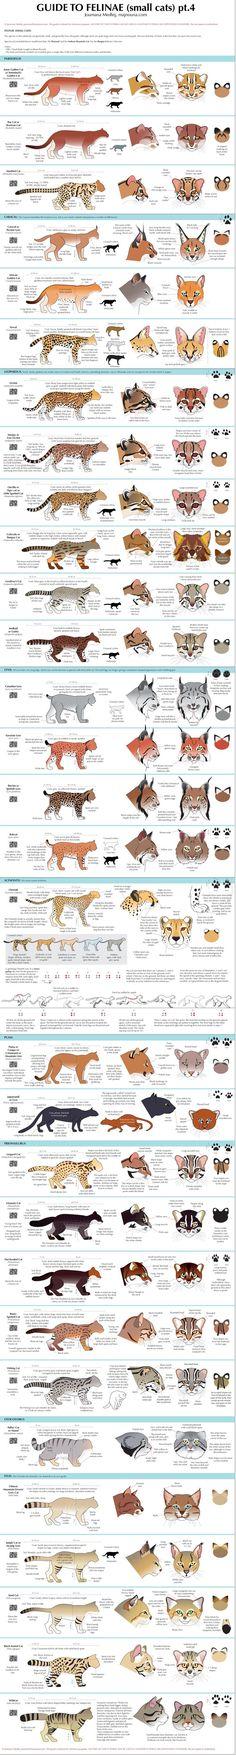 Guide to Felinae (pt4)